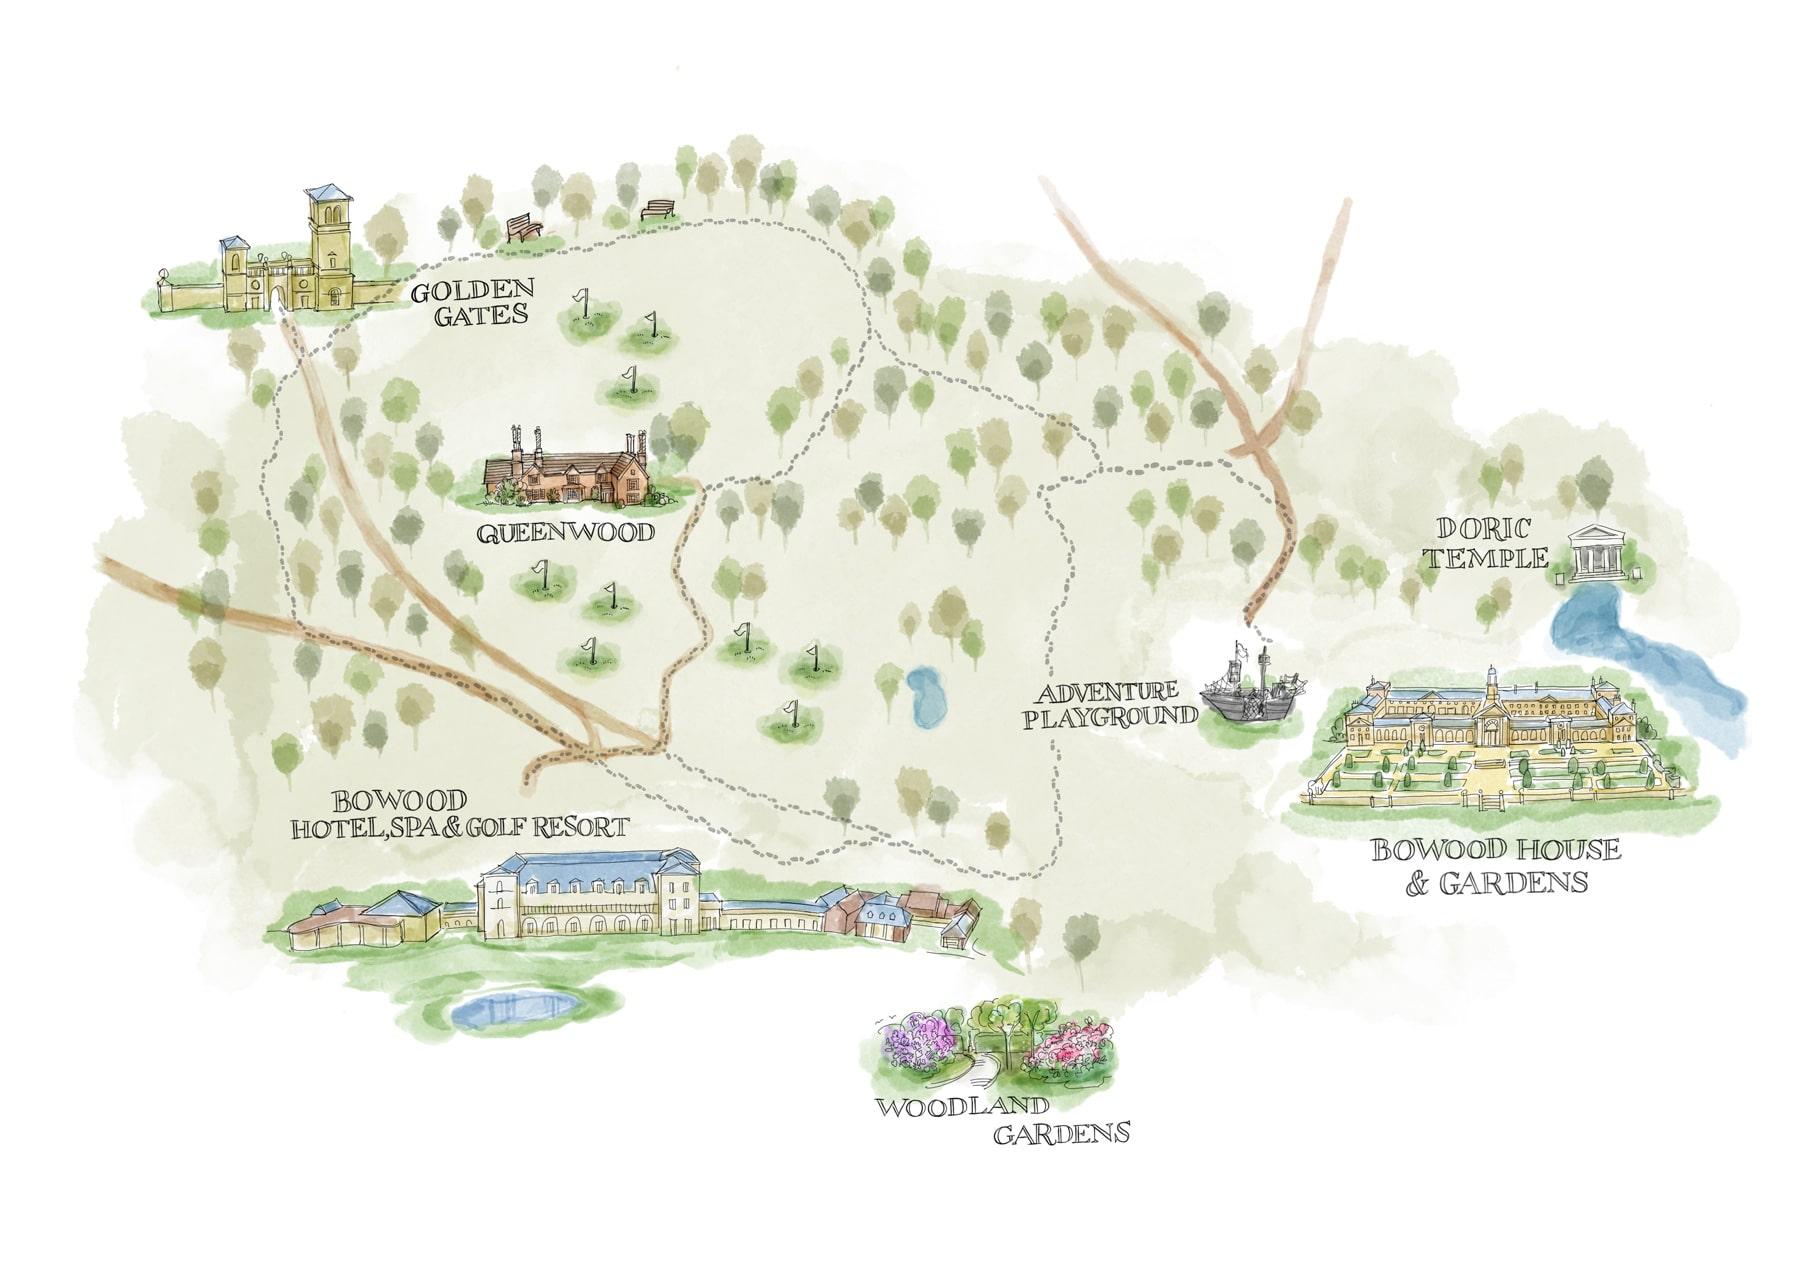 House Garden Map >> Gardens Wiltshire Country Estates Wiltshire Capability Brown